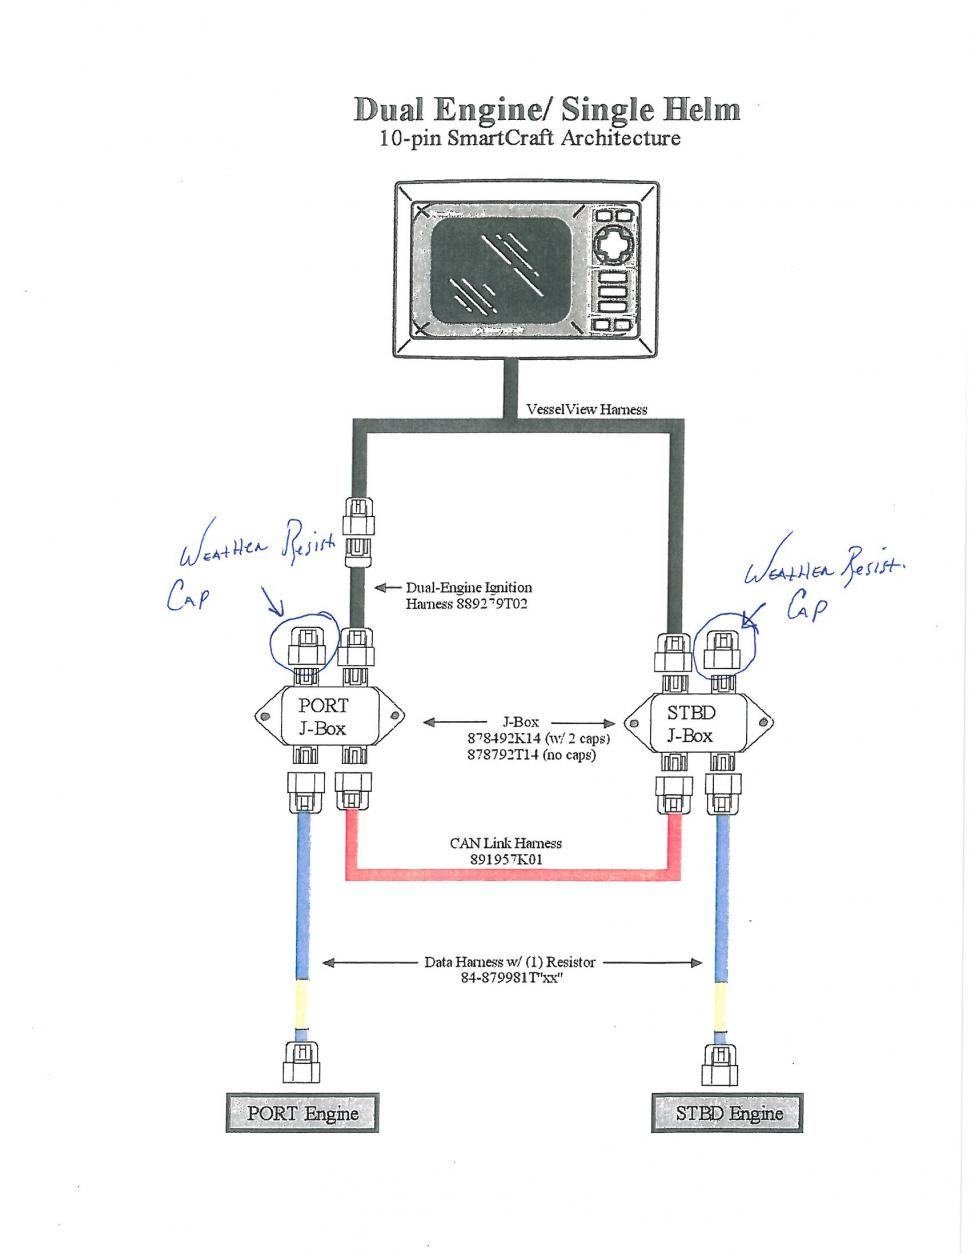 Mercury Smartcraft Wiring Diagram Dual Engine Trusted Diagrams Mercruiser Trim Sensor Gateway Club Sea Ray Evinrude Gauge